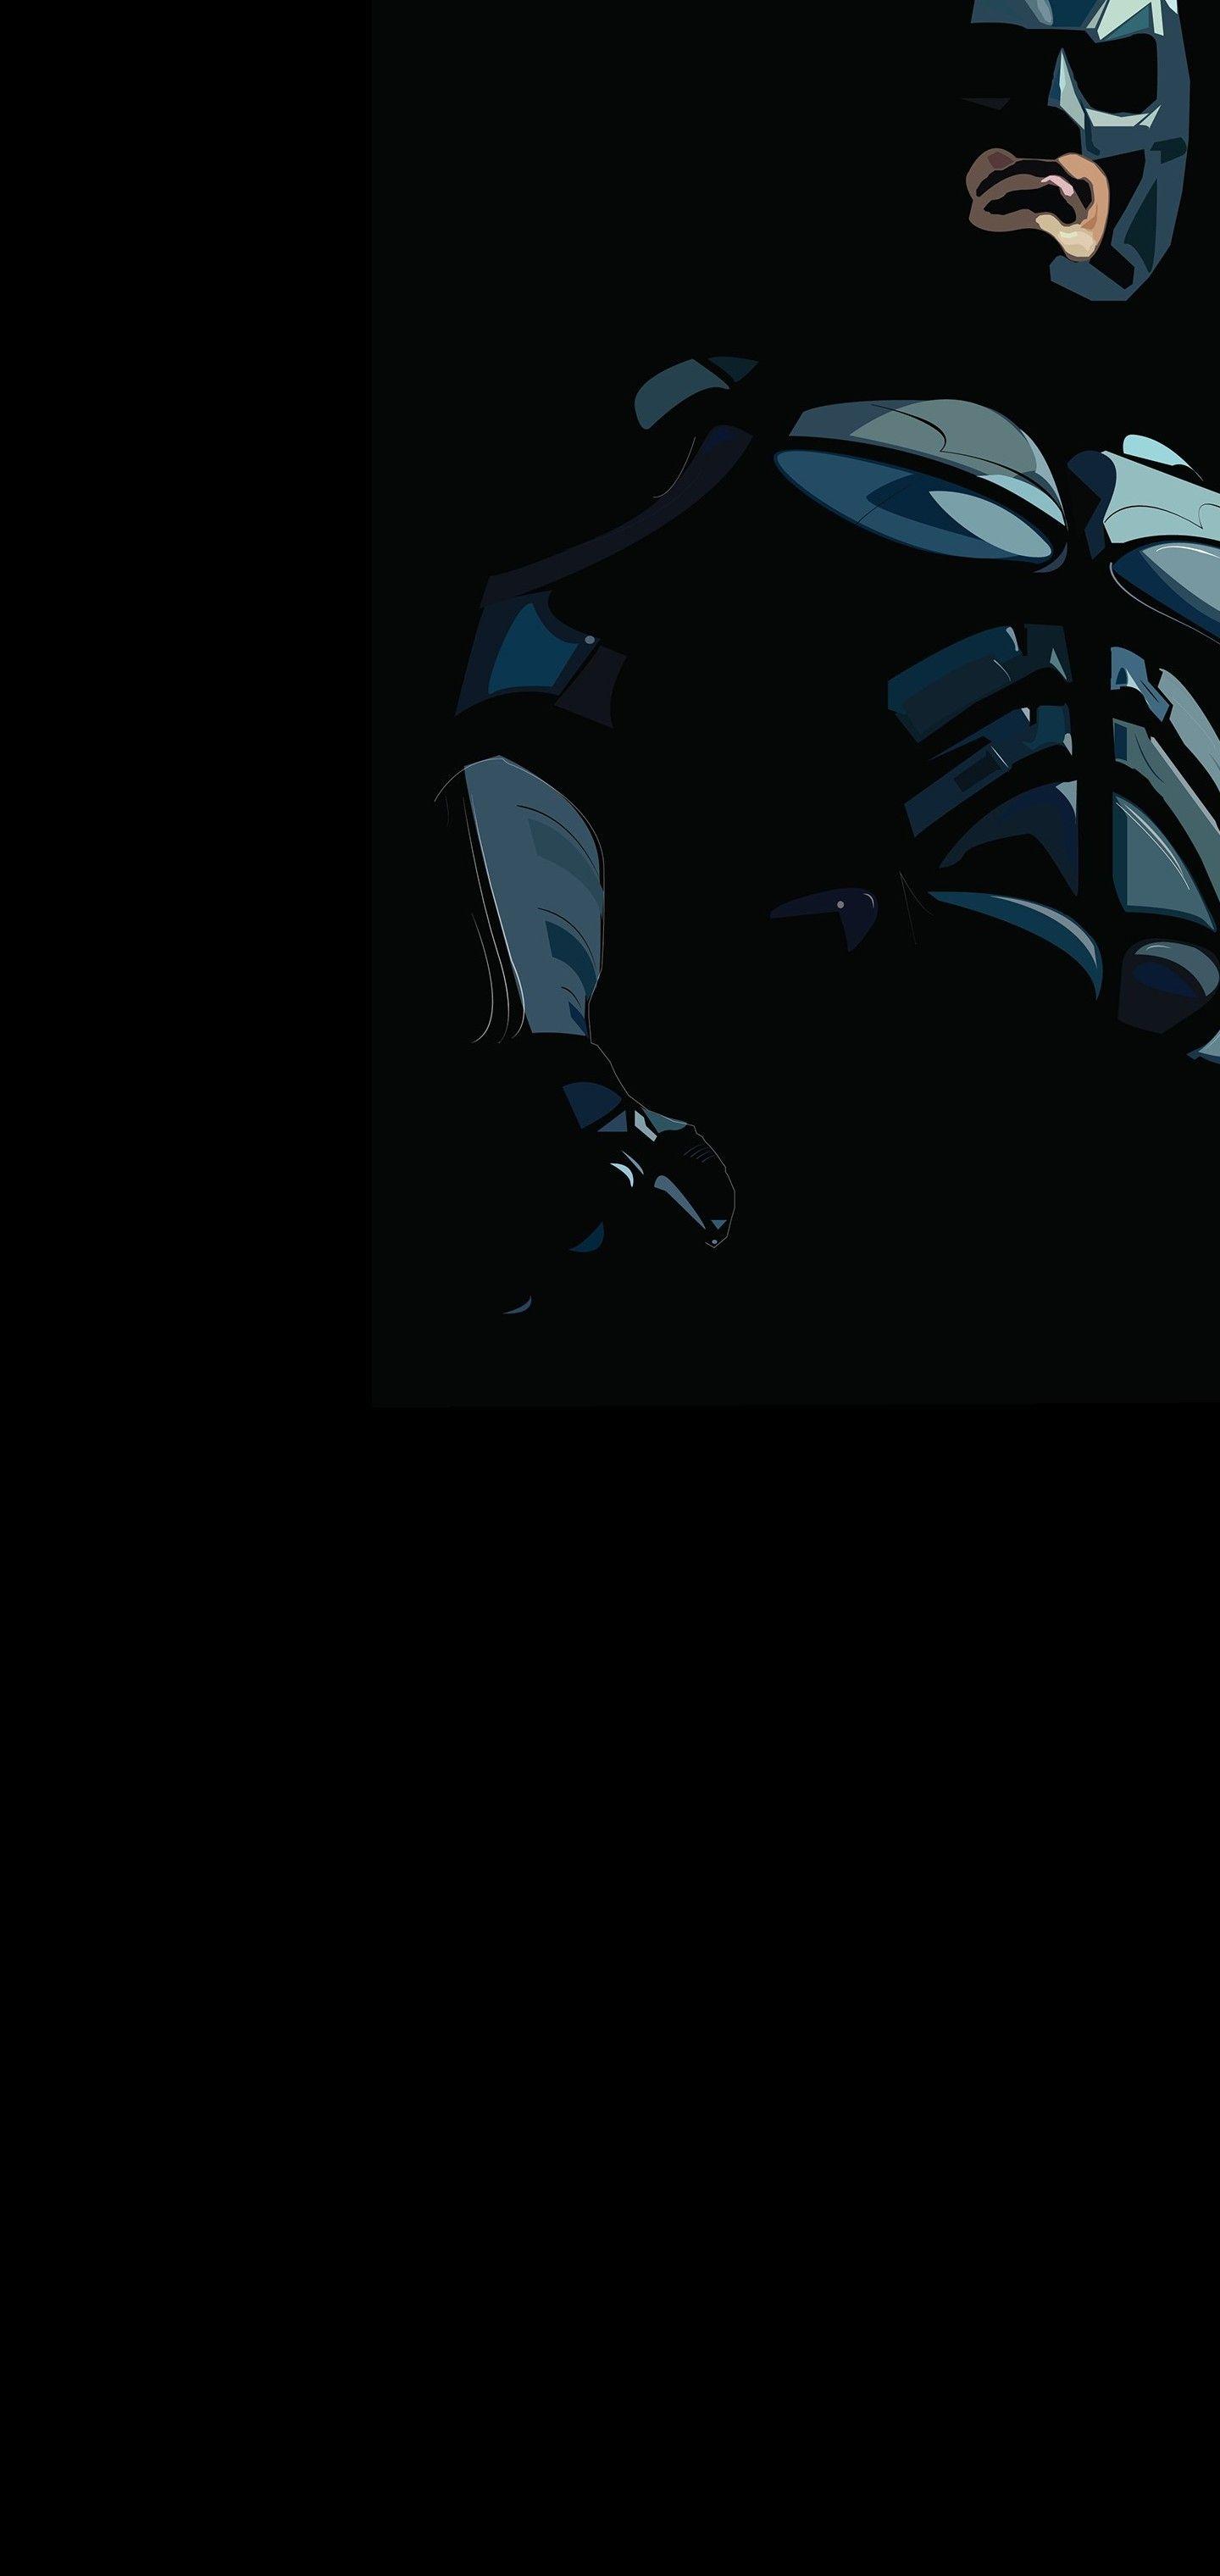 Download Galaxy S10 Plus Batman Wallpaper Papel De Parede